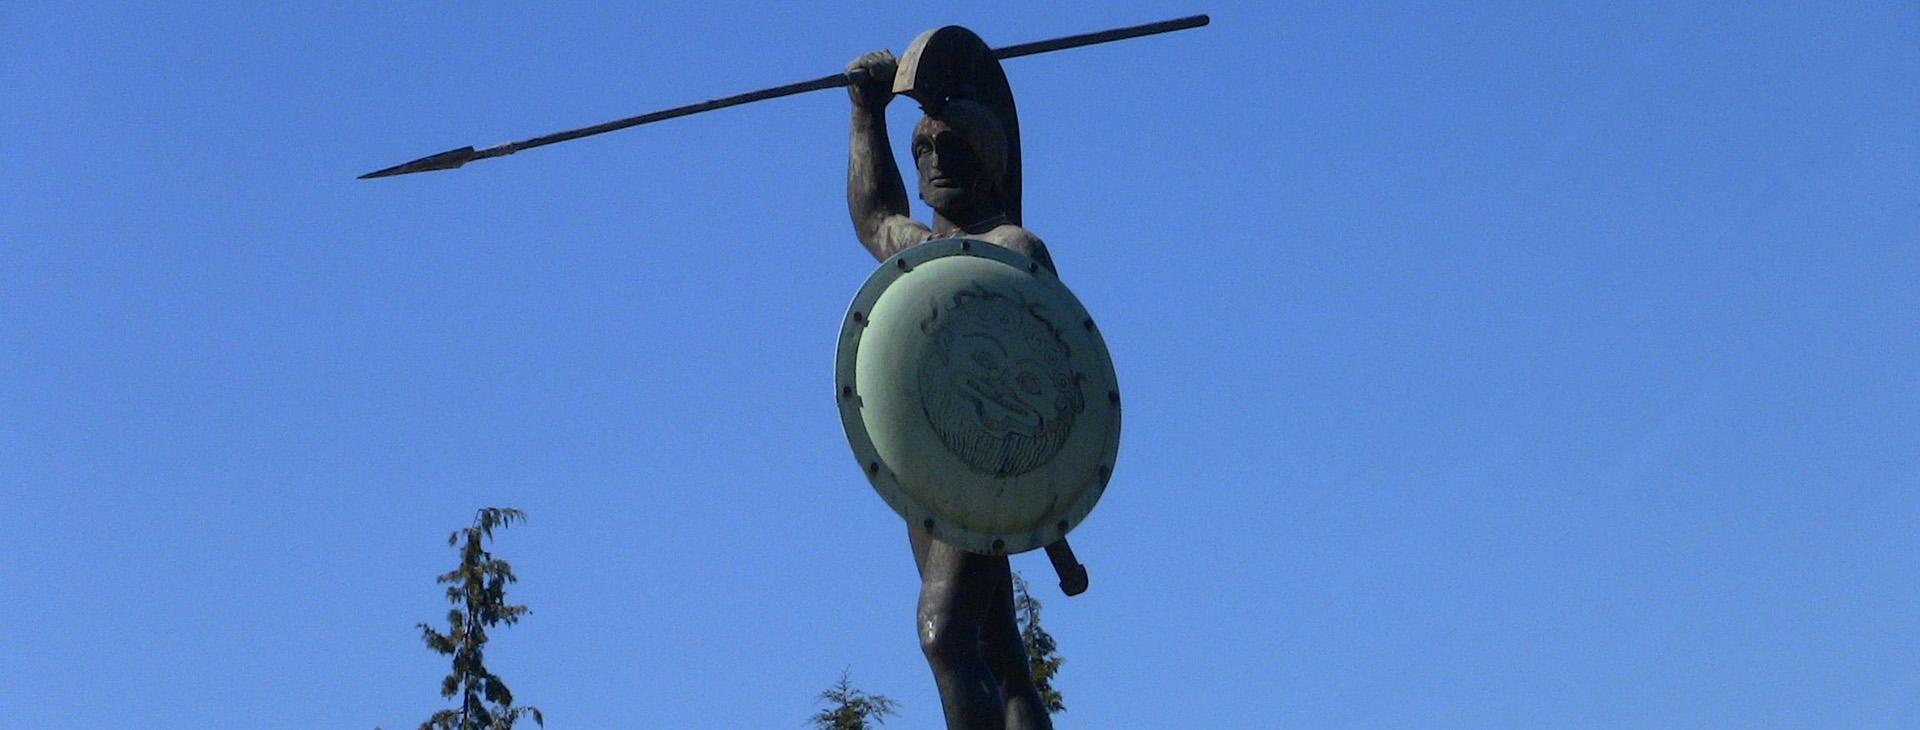 King Leonidas statue / Battle of Thermopylae monument